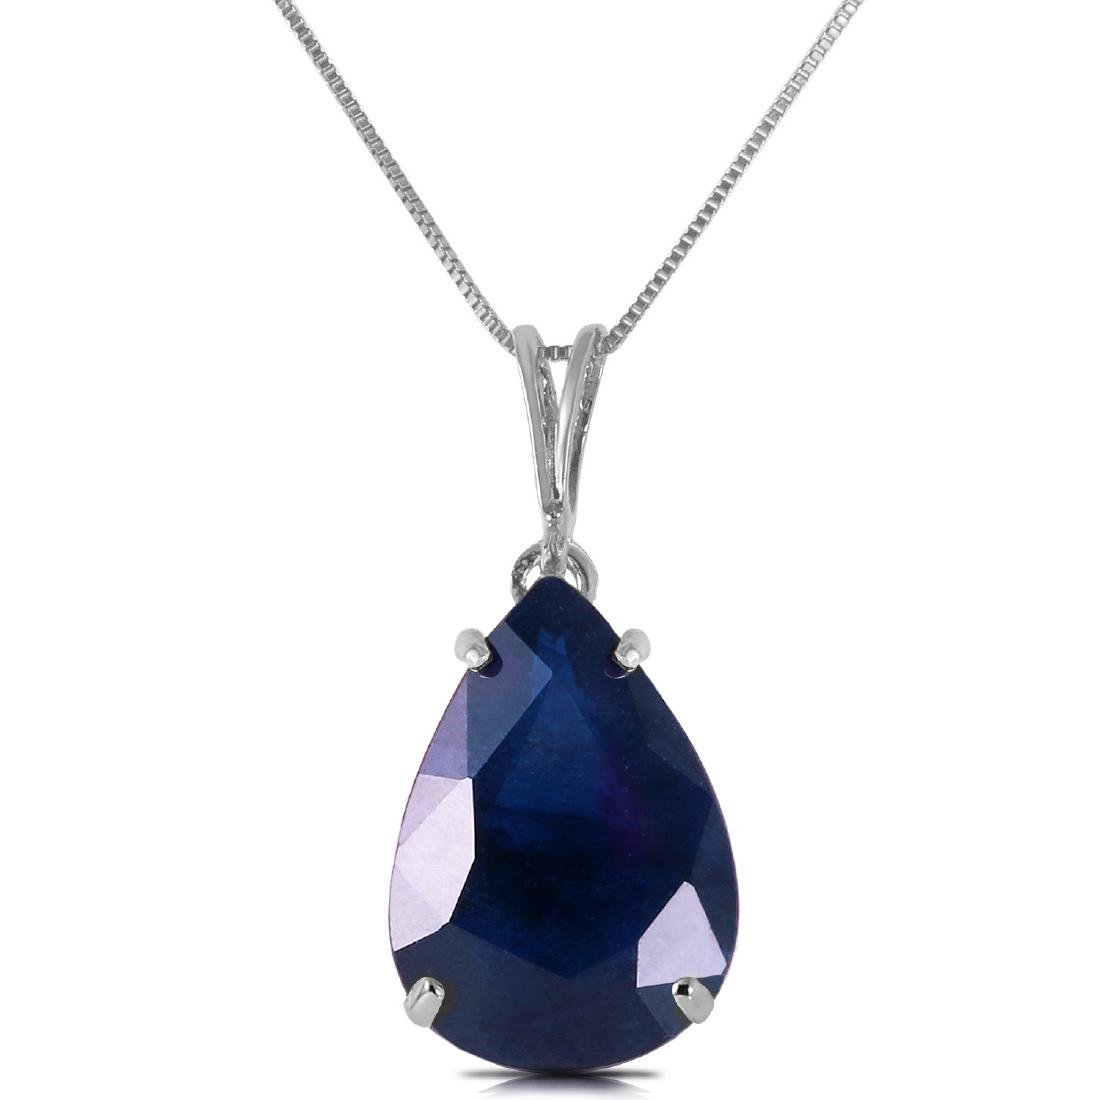 Genuine 4.65 ctw Sapphire Necklace Jewelry 14KT White